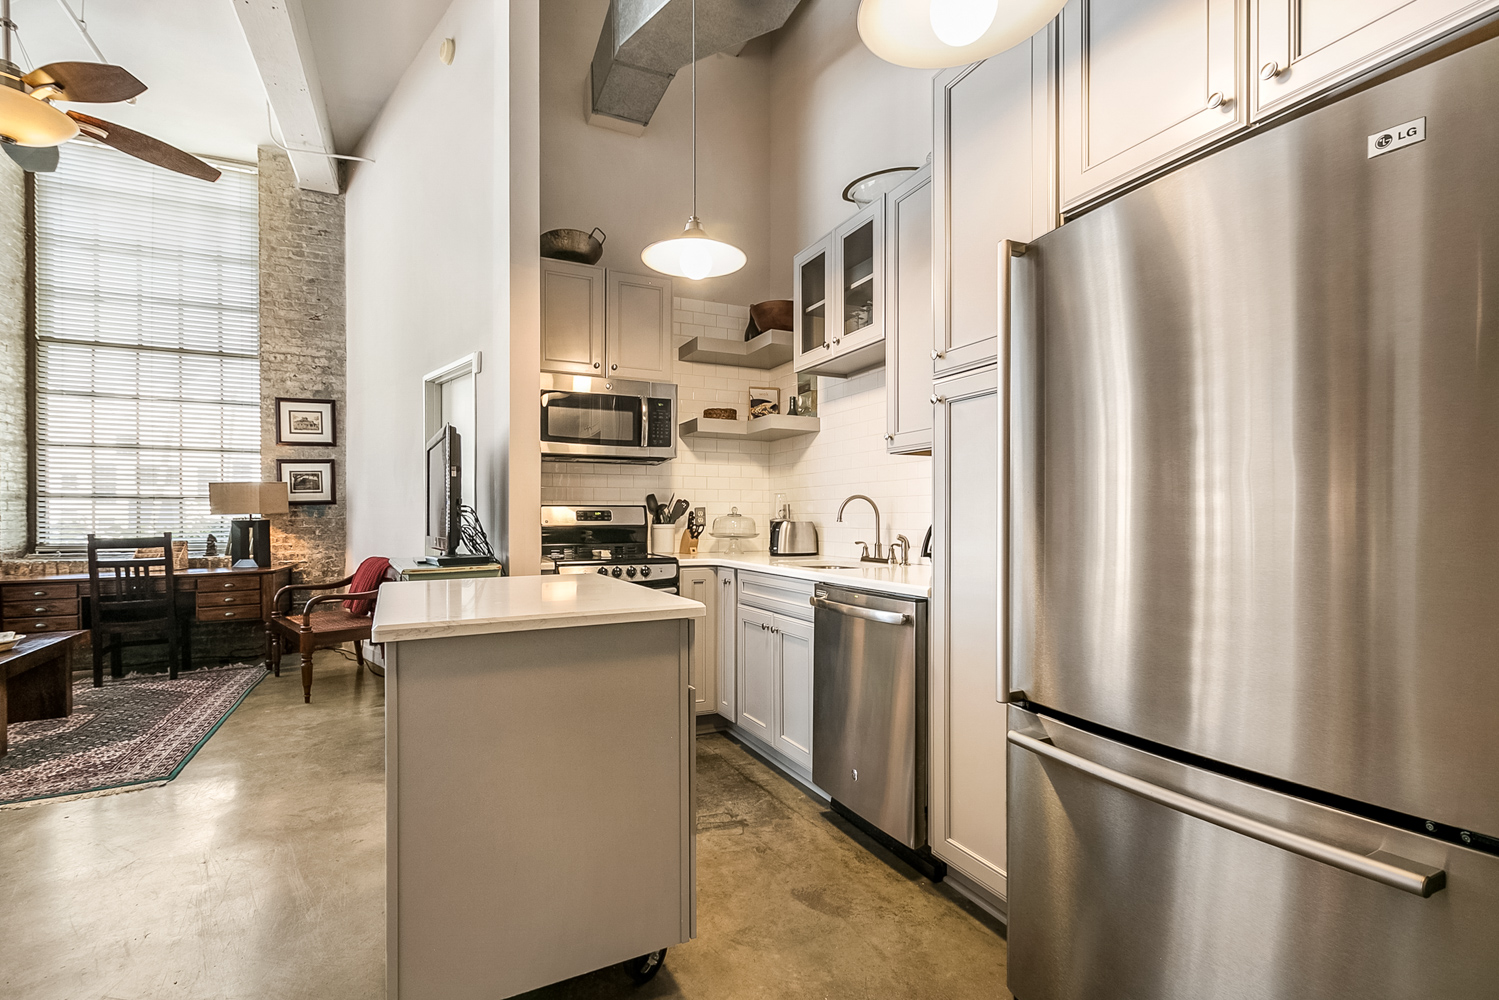 CBD/Warehouse District/South Market, Condo, 2 beds, 2.0 baths, $3600 per month New Orleans Rental - devie image_5